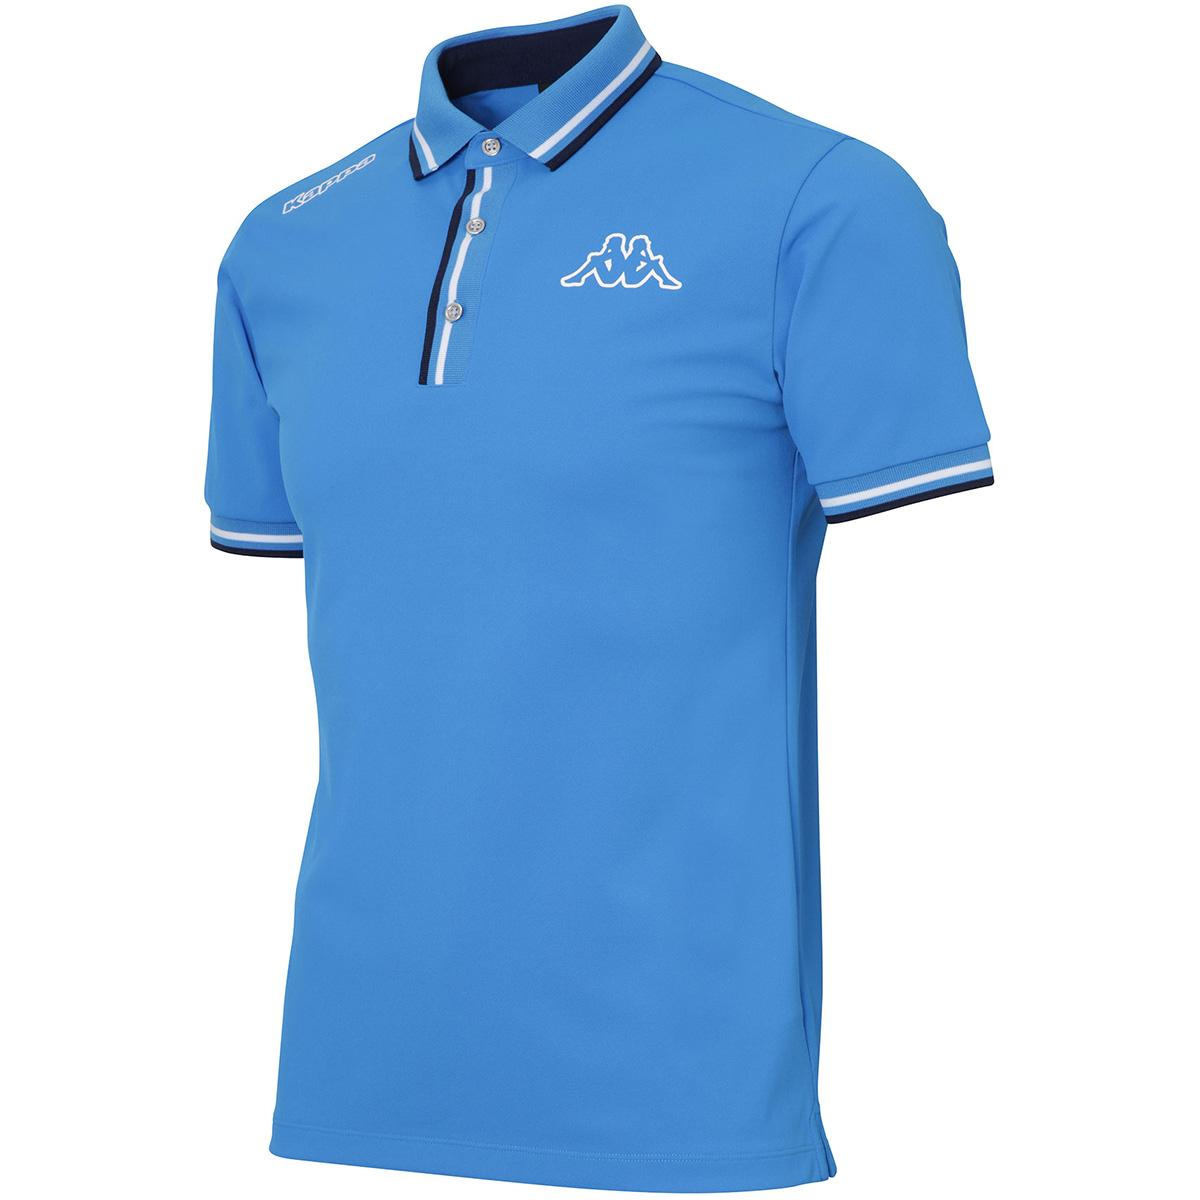 Kappa GOLF KOMBAT リブライン半袖ポロシャツ